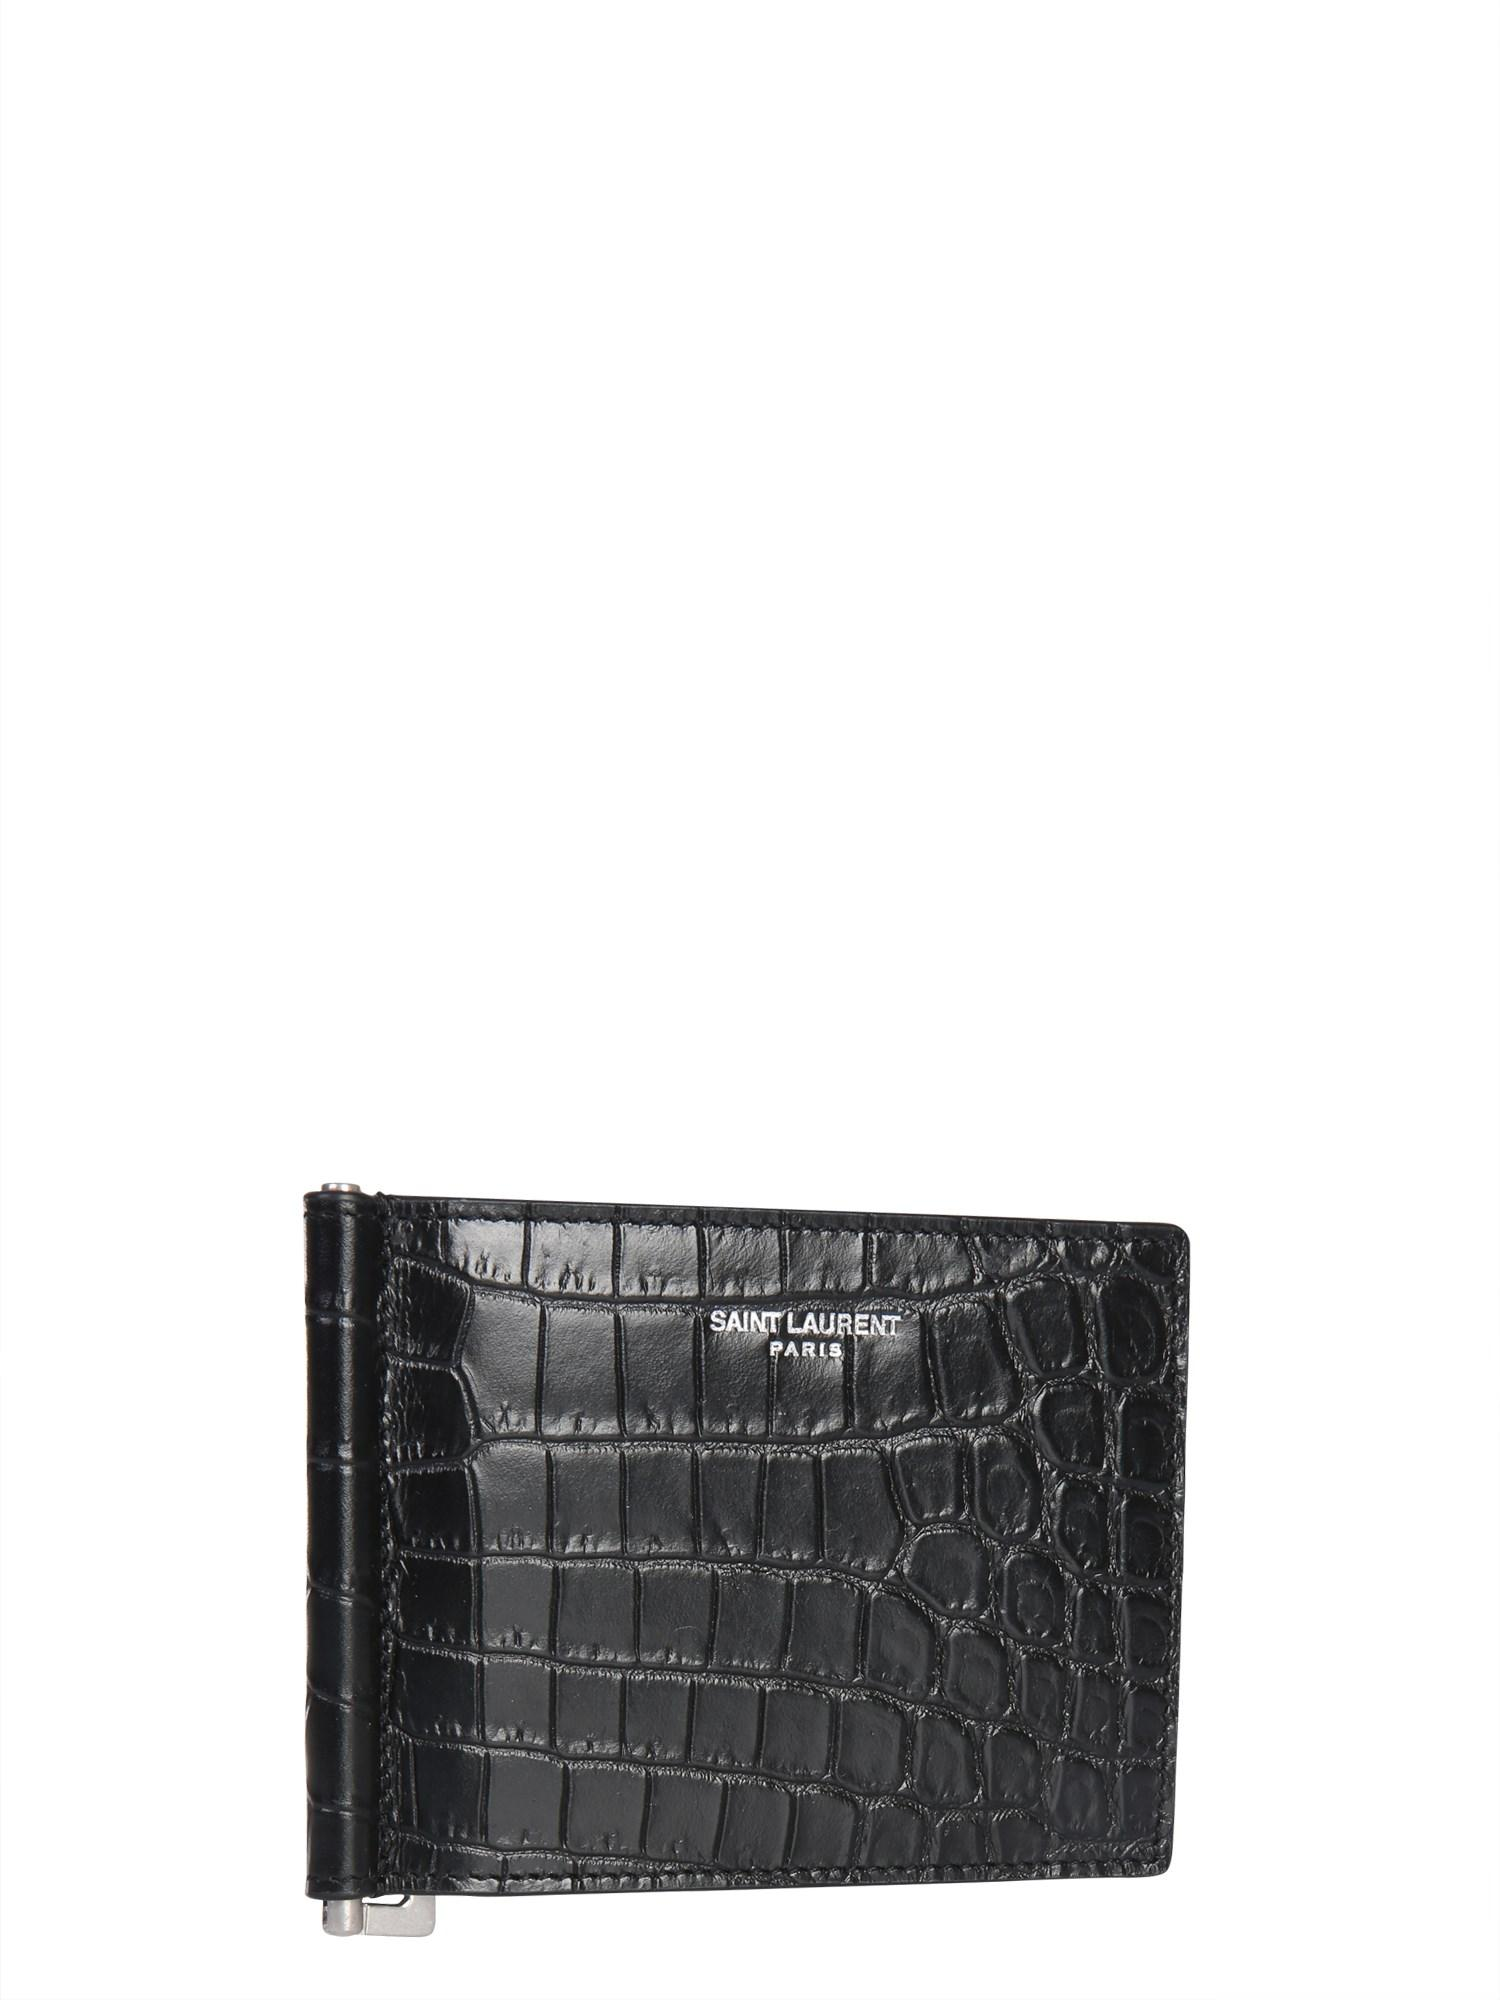 902a697764b Lyst - Saint Laurent Crocodile Printed Leather Card Holder in Black for Men